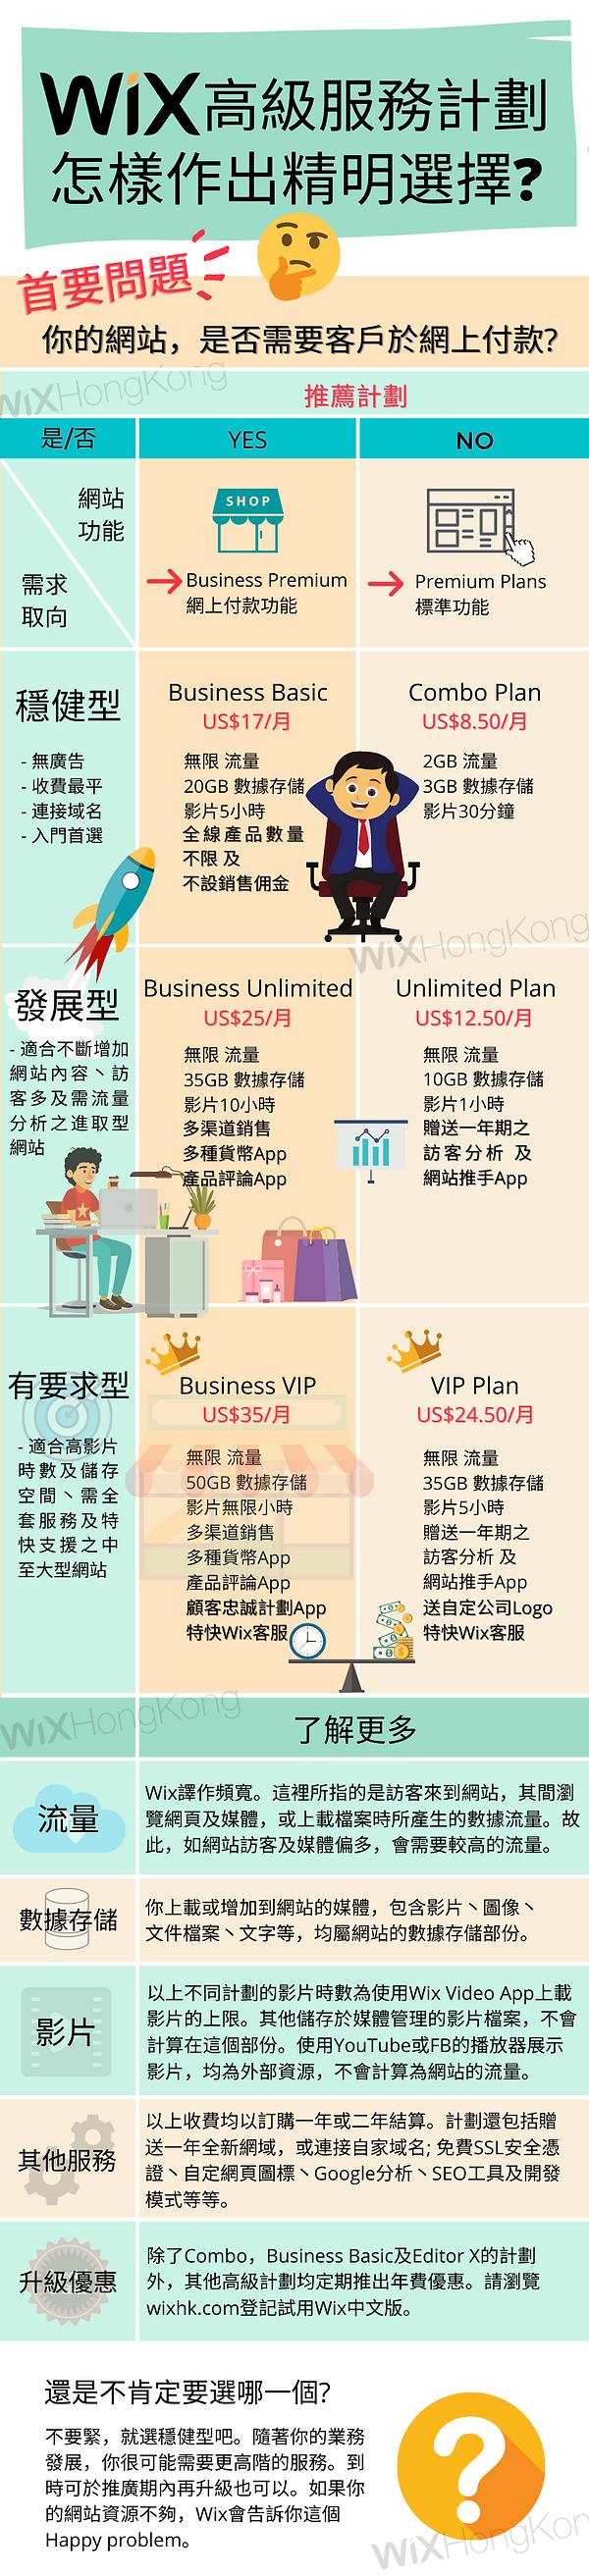 Wix Premium Plans.png